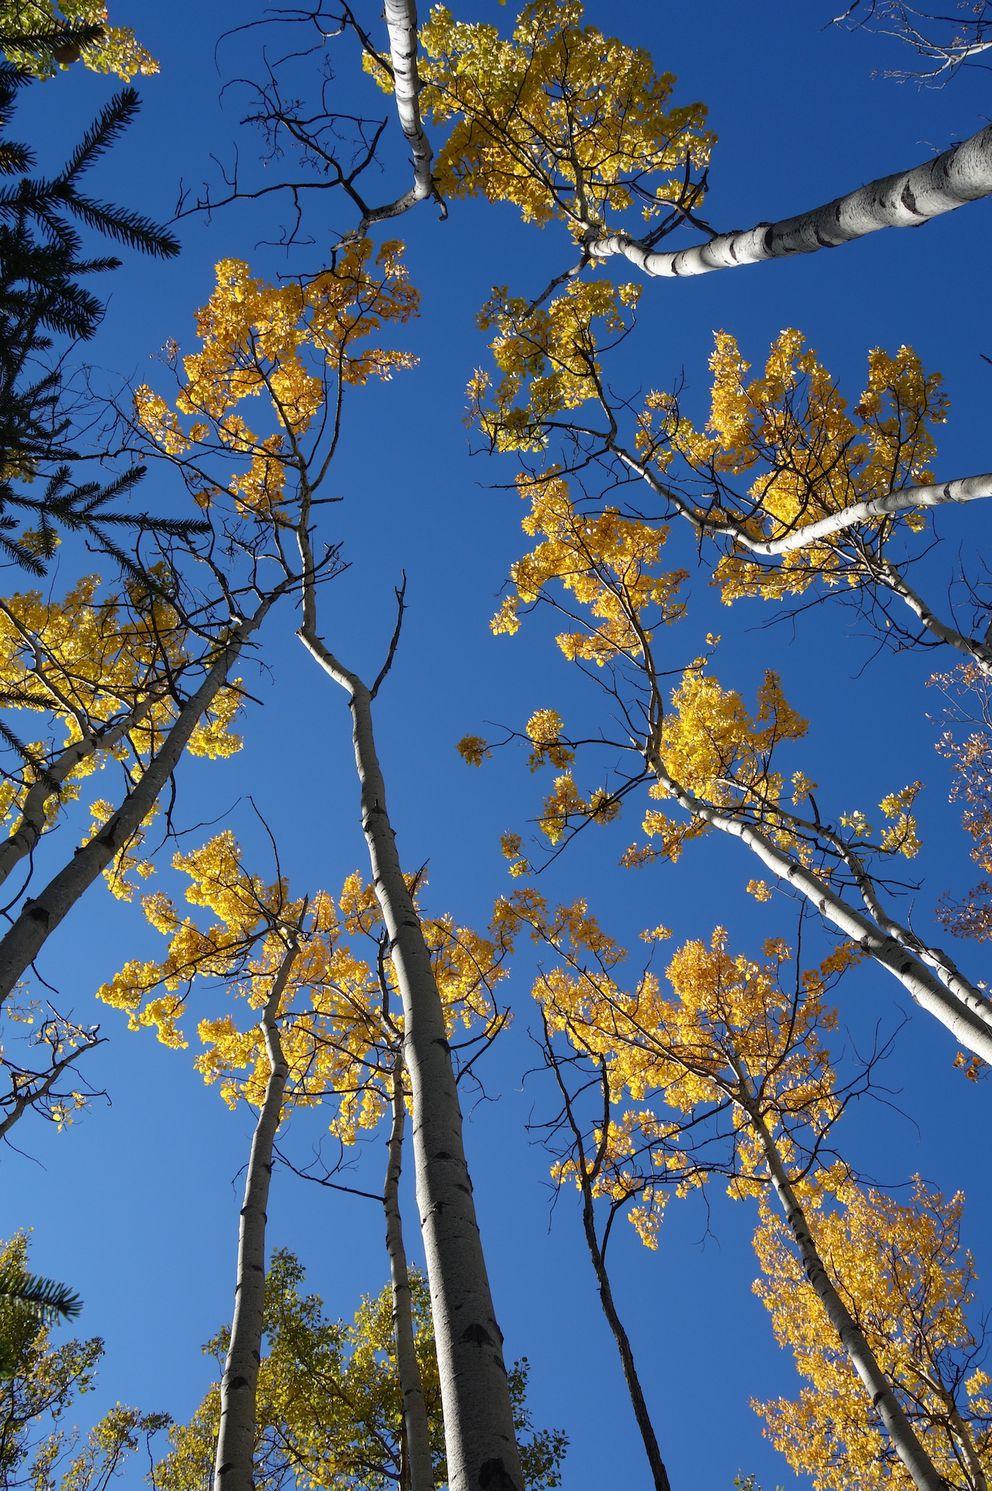 Aspen trees near Glennallen, Alaska. (Photo by Ned Rozell)